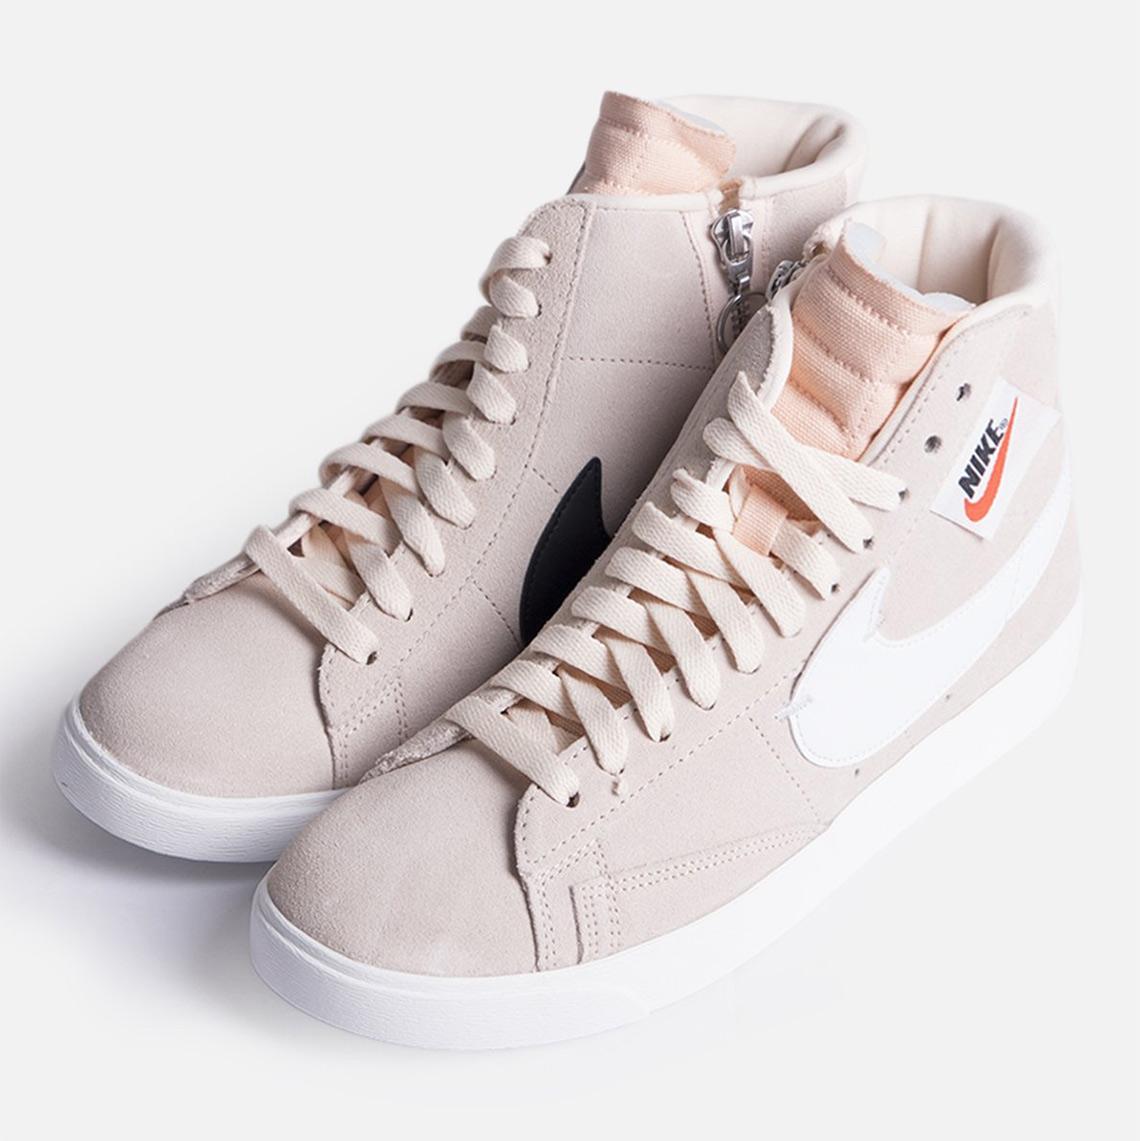 3e16dade38f Nike Blazer Mid Rebel BQ4022-001 BQ4022-201 BQ4022-801 | SneakerNews.com